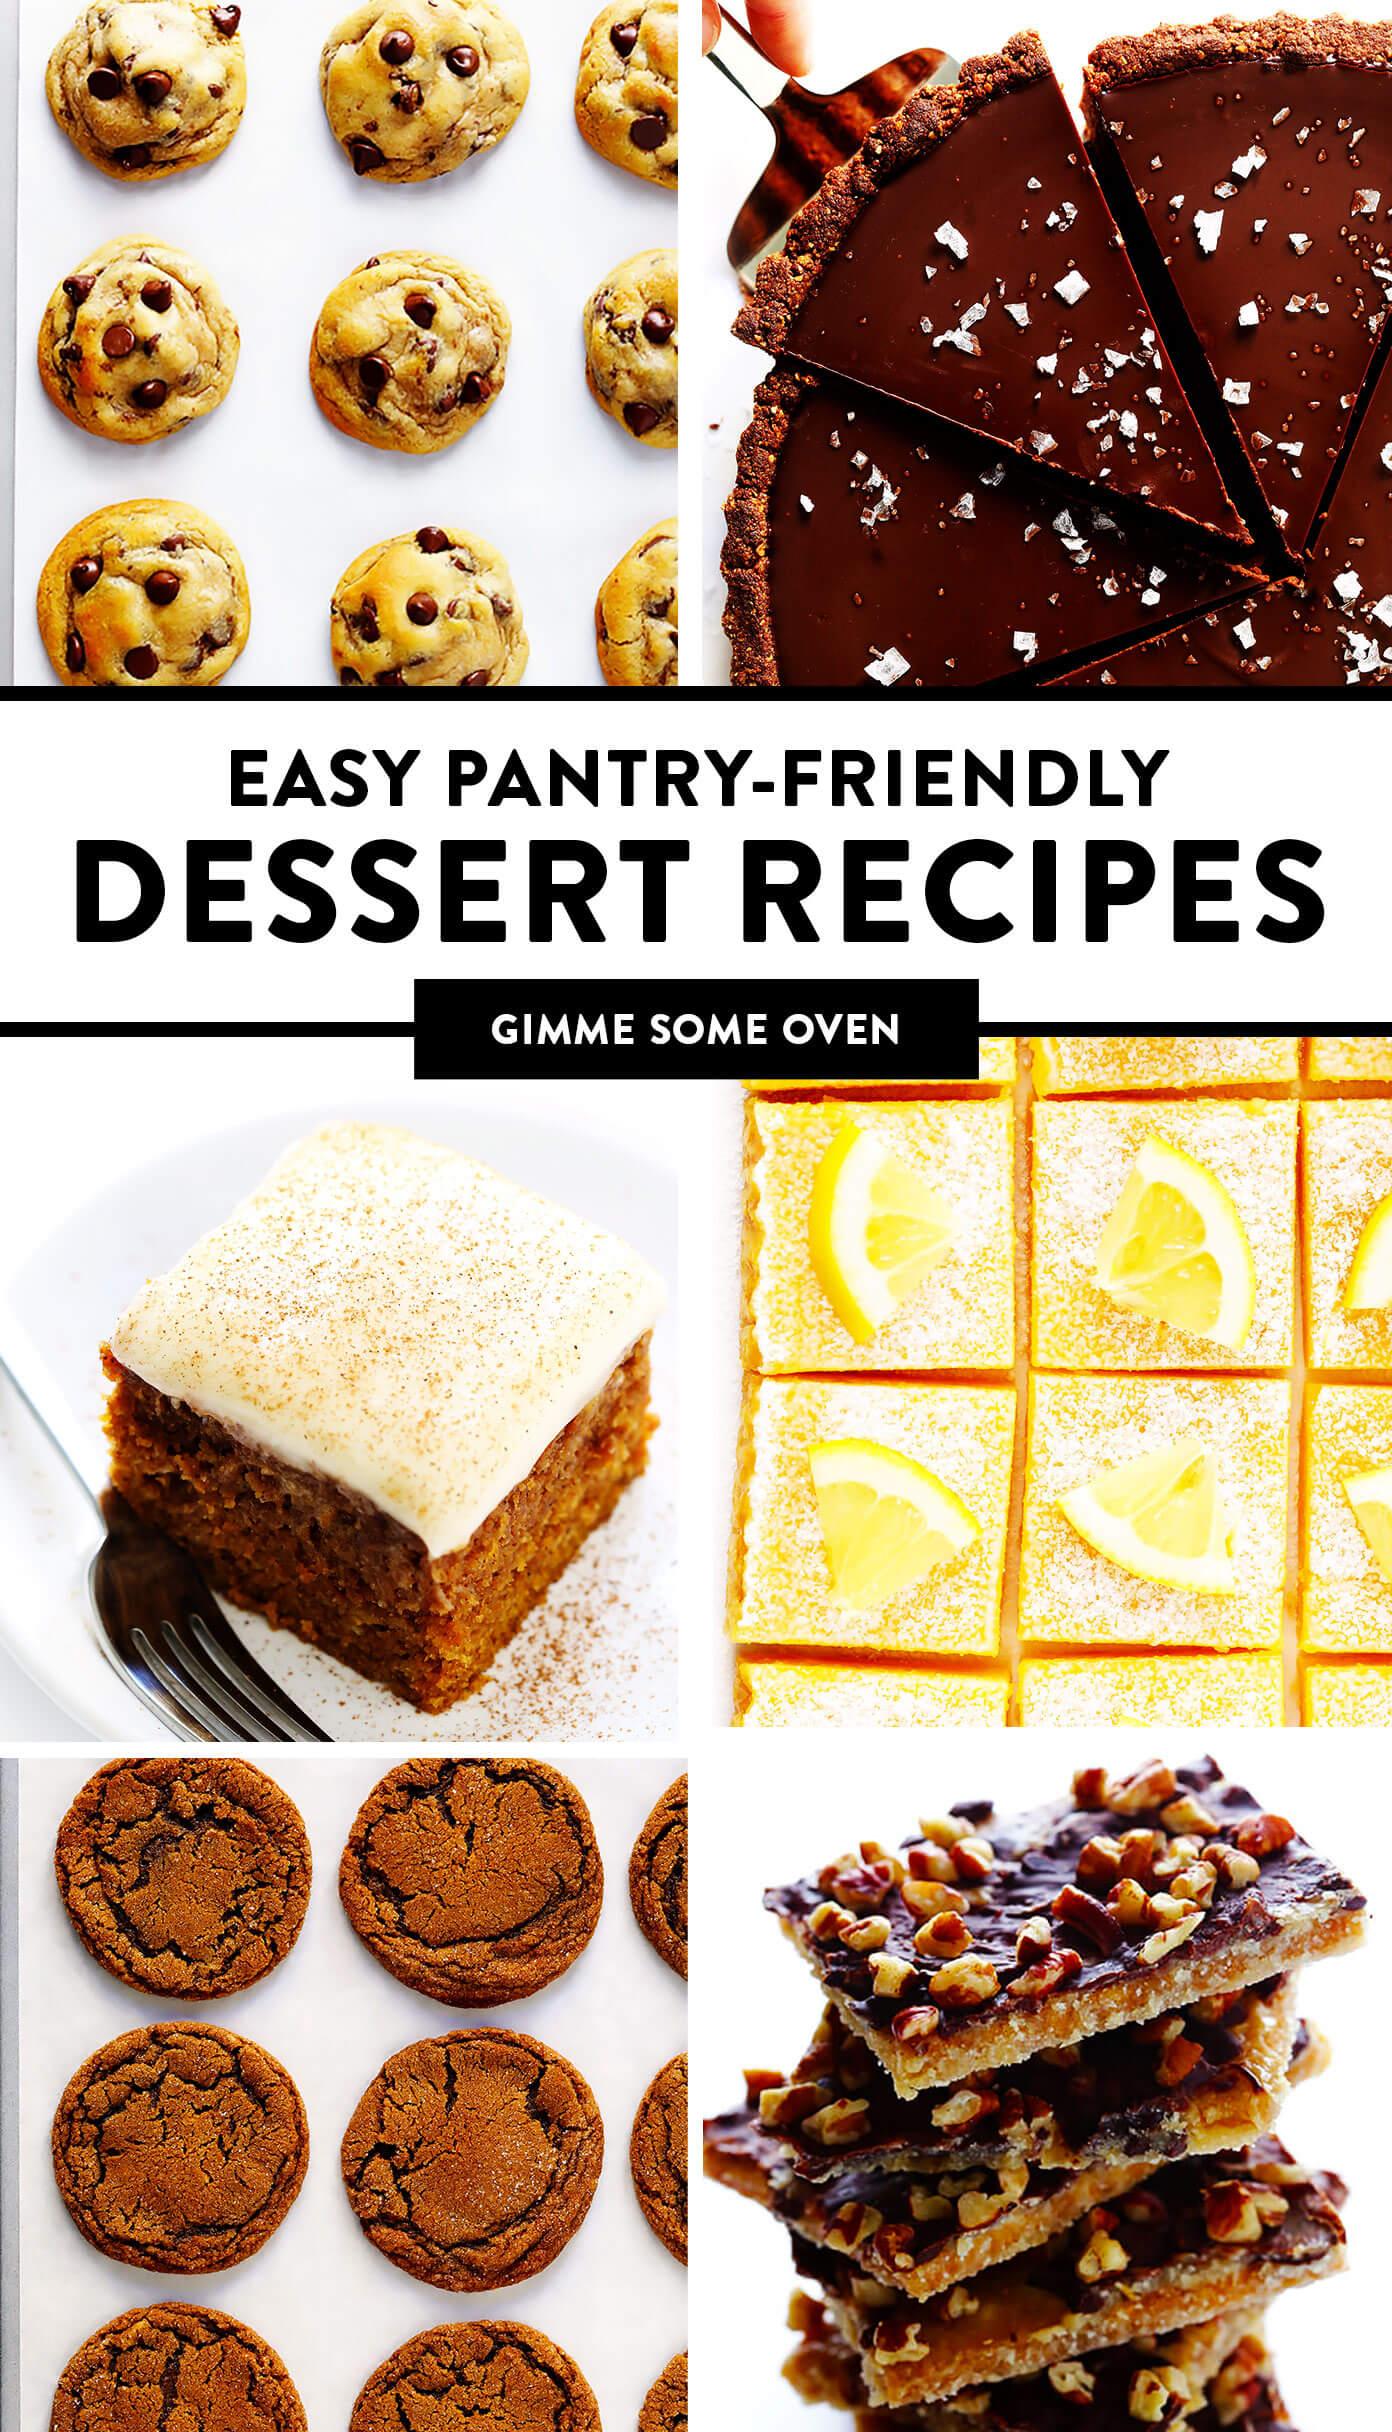 Easy Pantry-Friendly Dessert Recipes